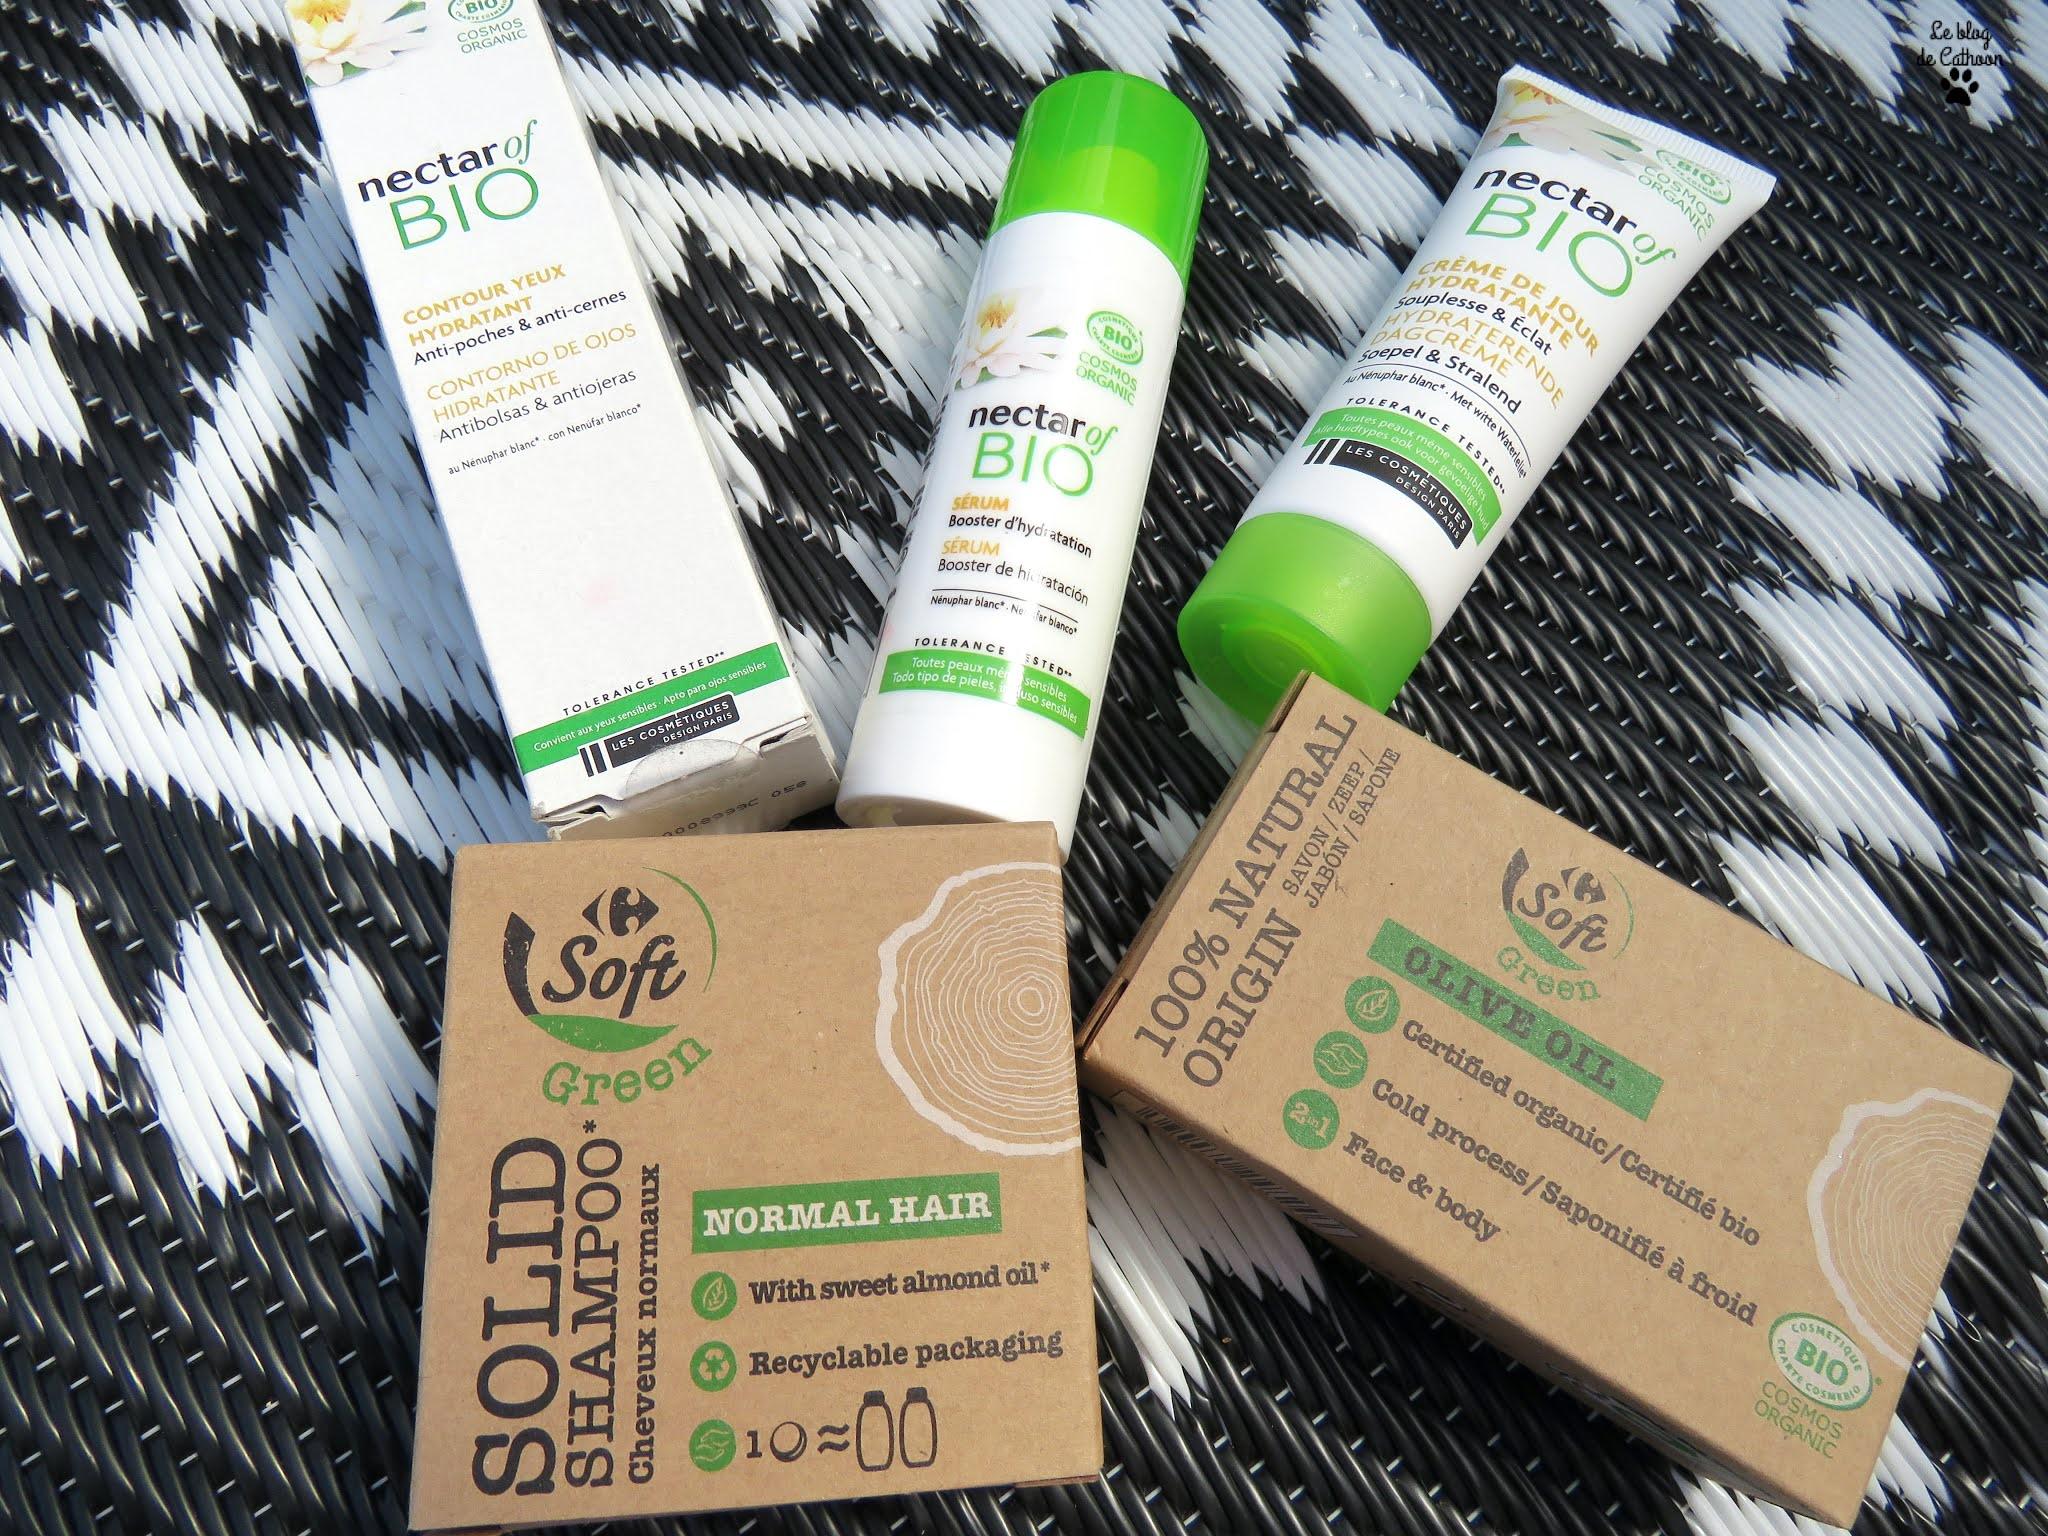 Nectar Of Bio 👉 La gamme bio et naturel de Carrefour